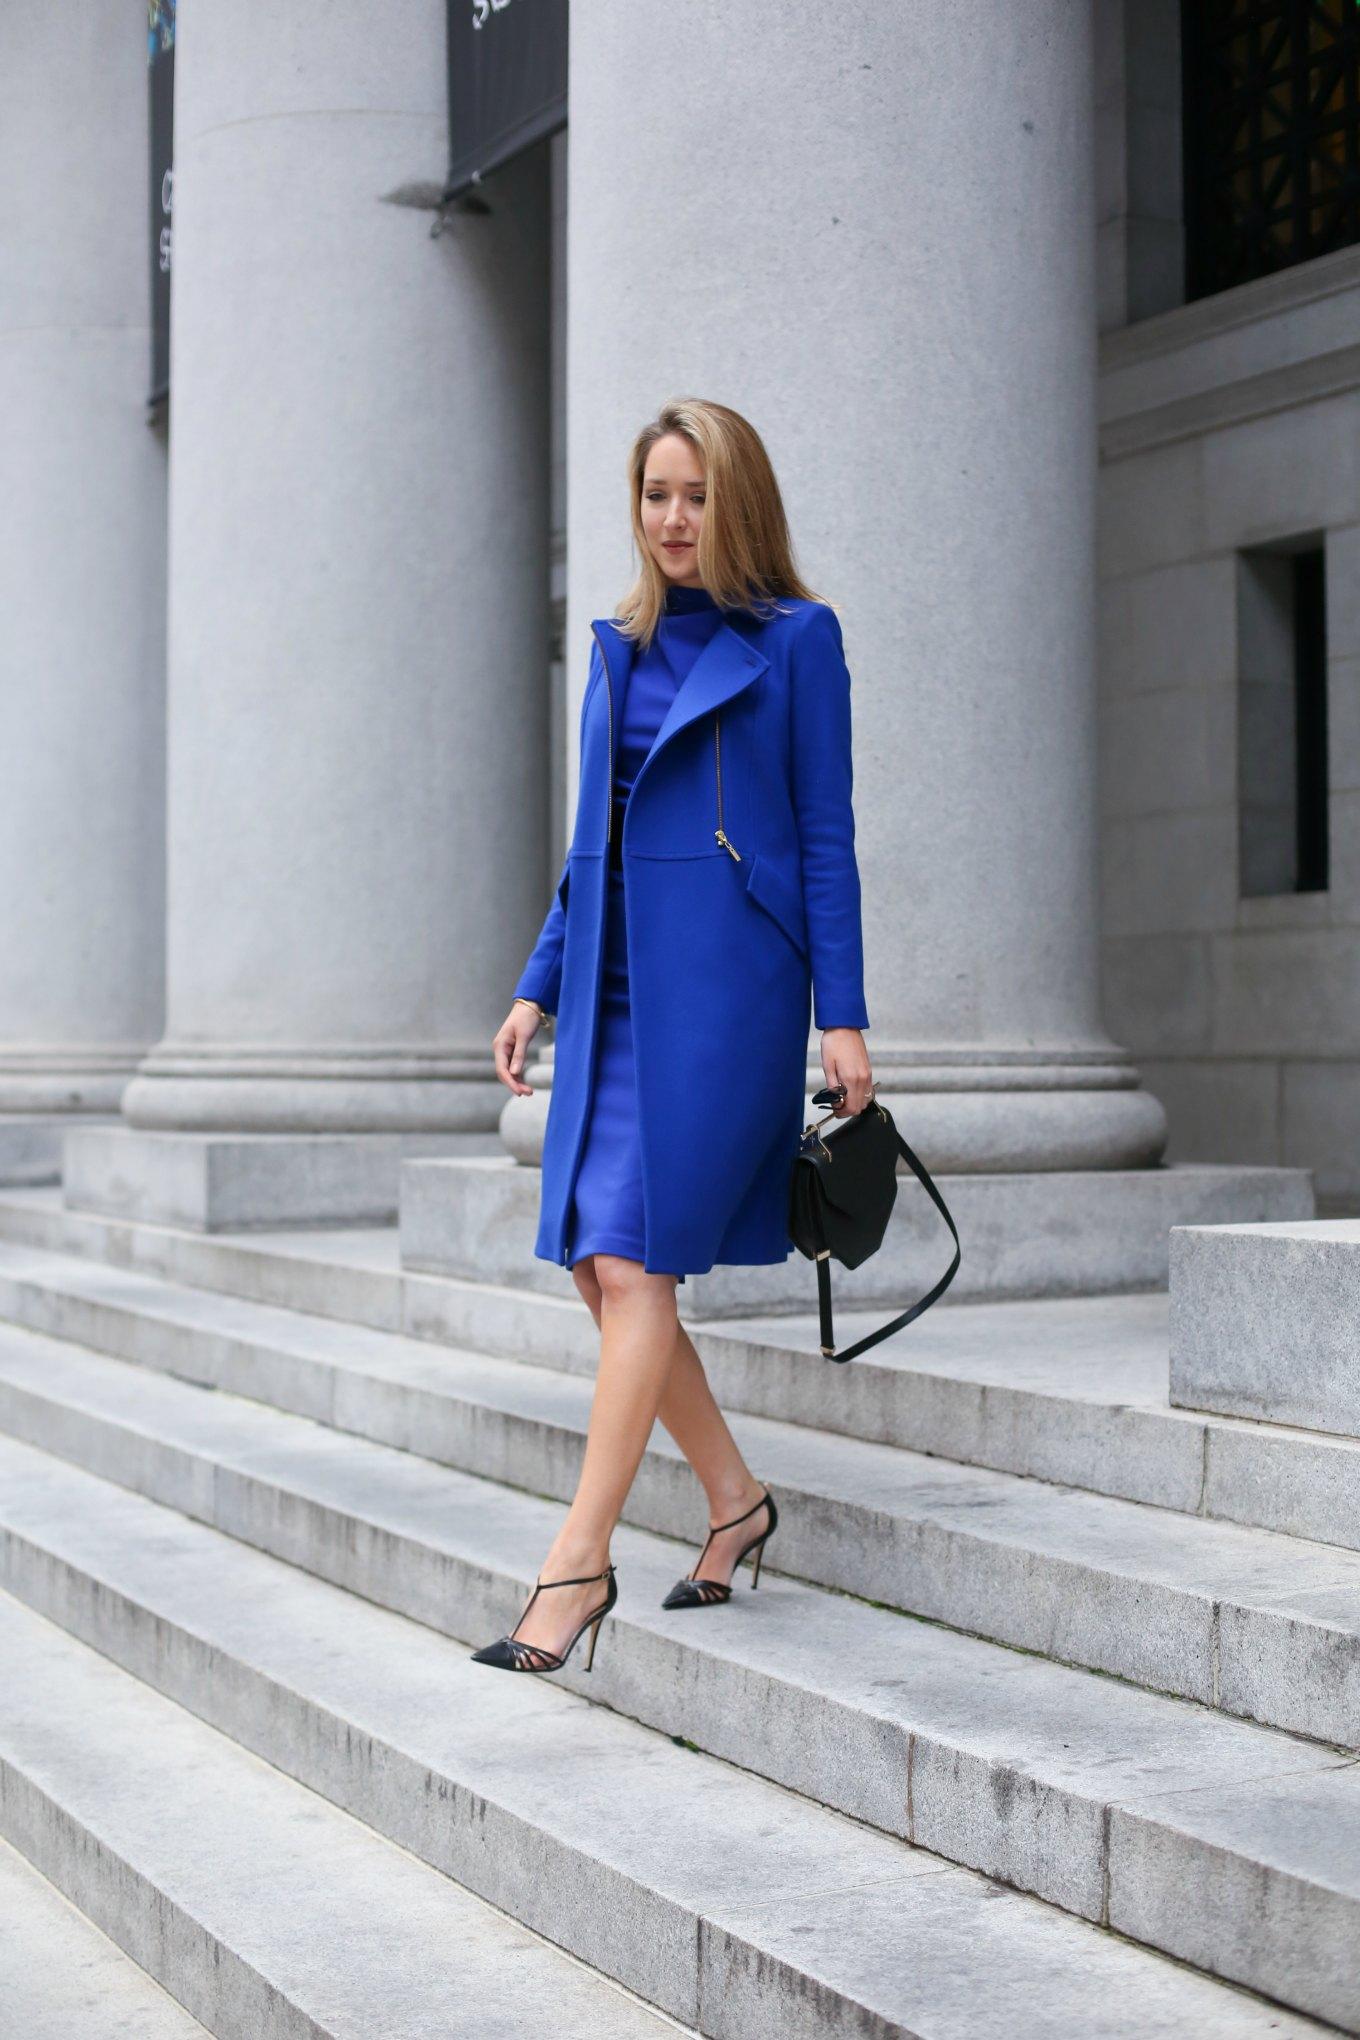 cobalt-monochromatic-coat-sheath-dress-cowl-badgley-mischka-sjp-collection-carrie-pumps-work-wear-office-style-fashion-blog-san-francisco-sf6